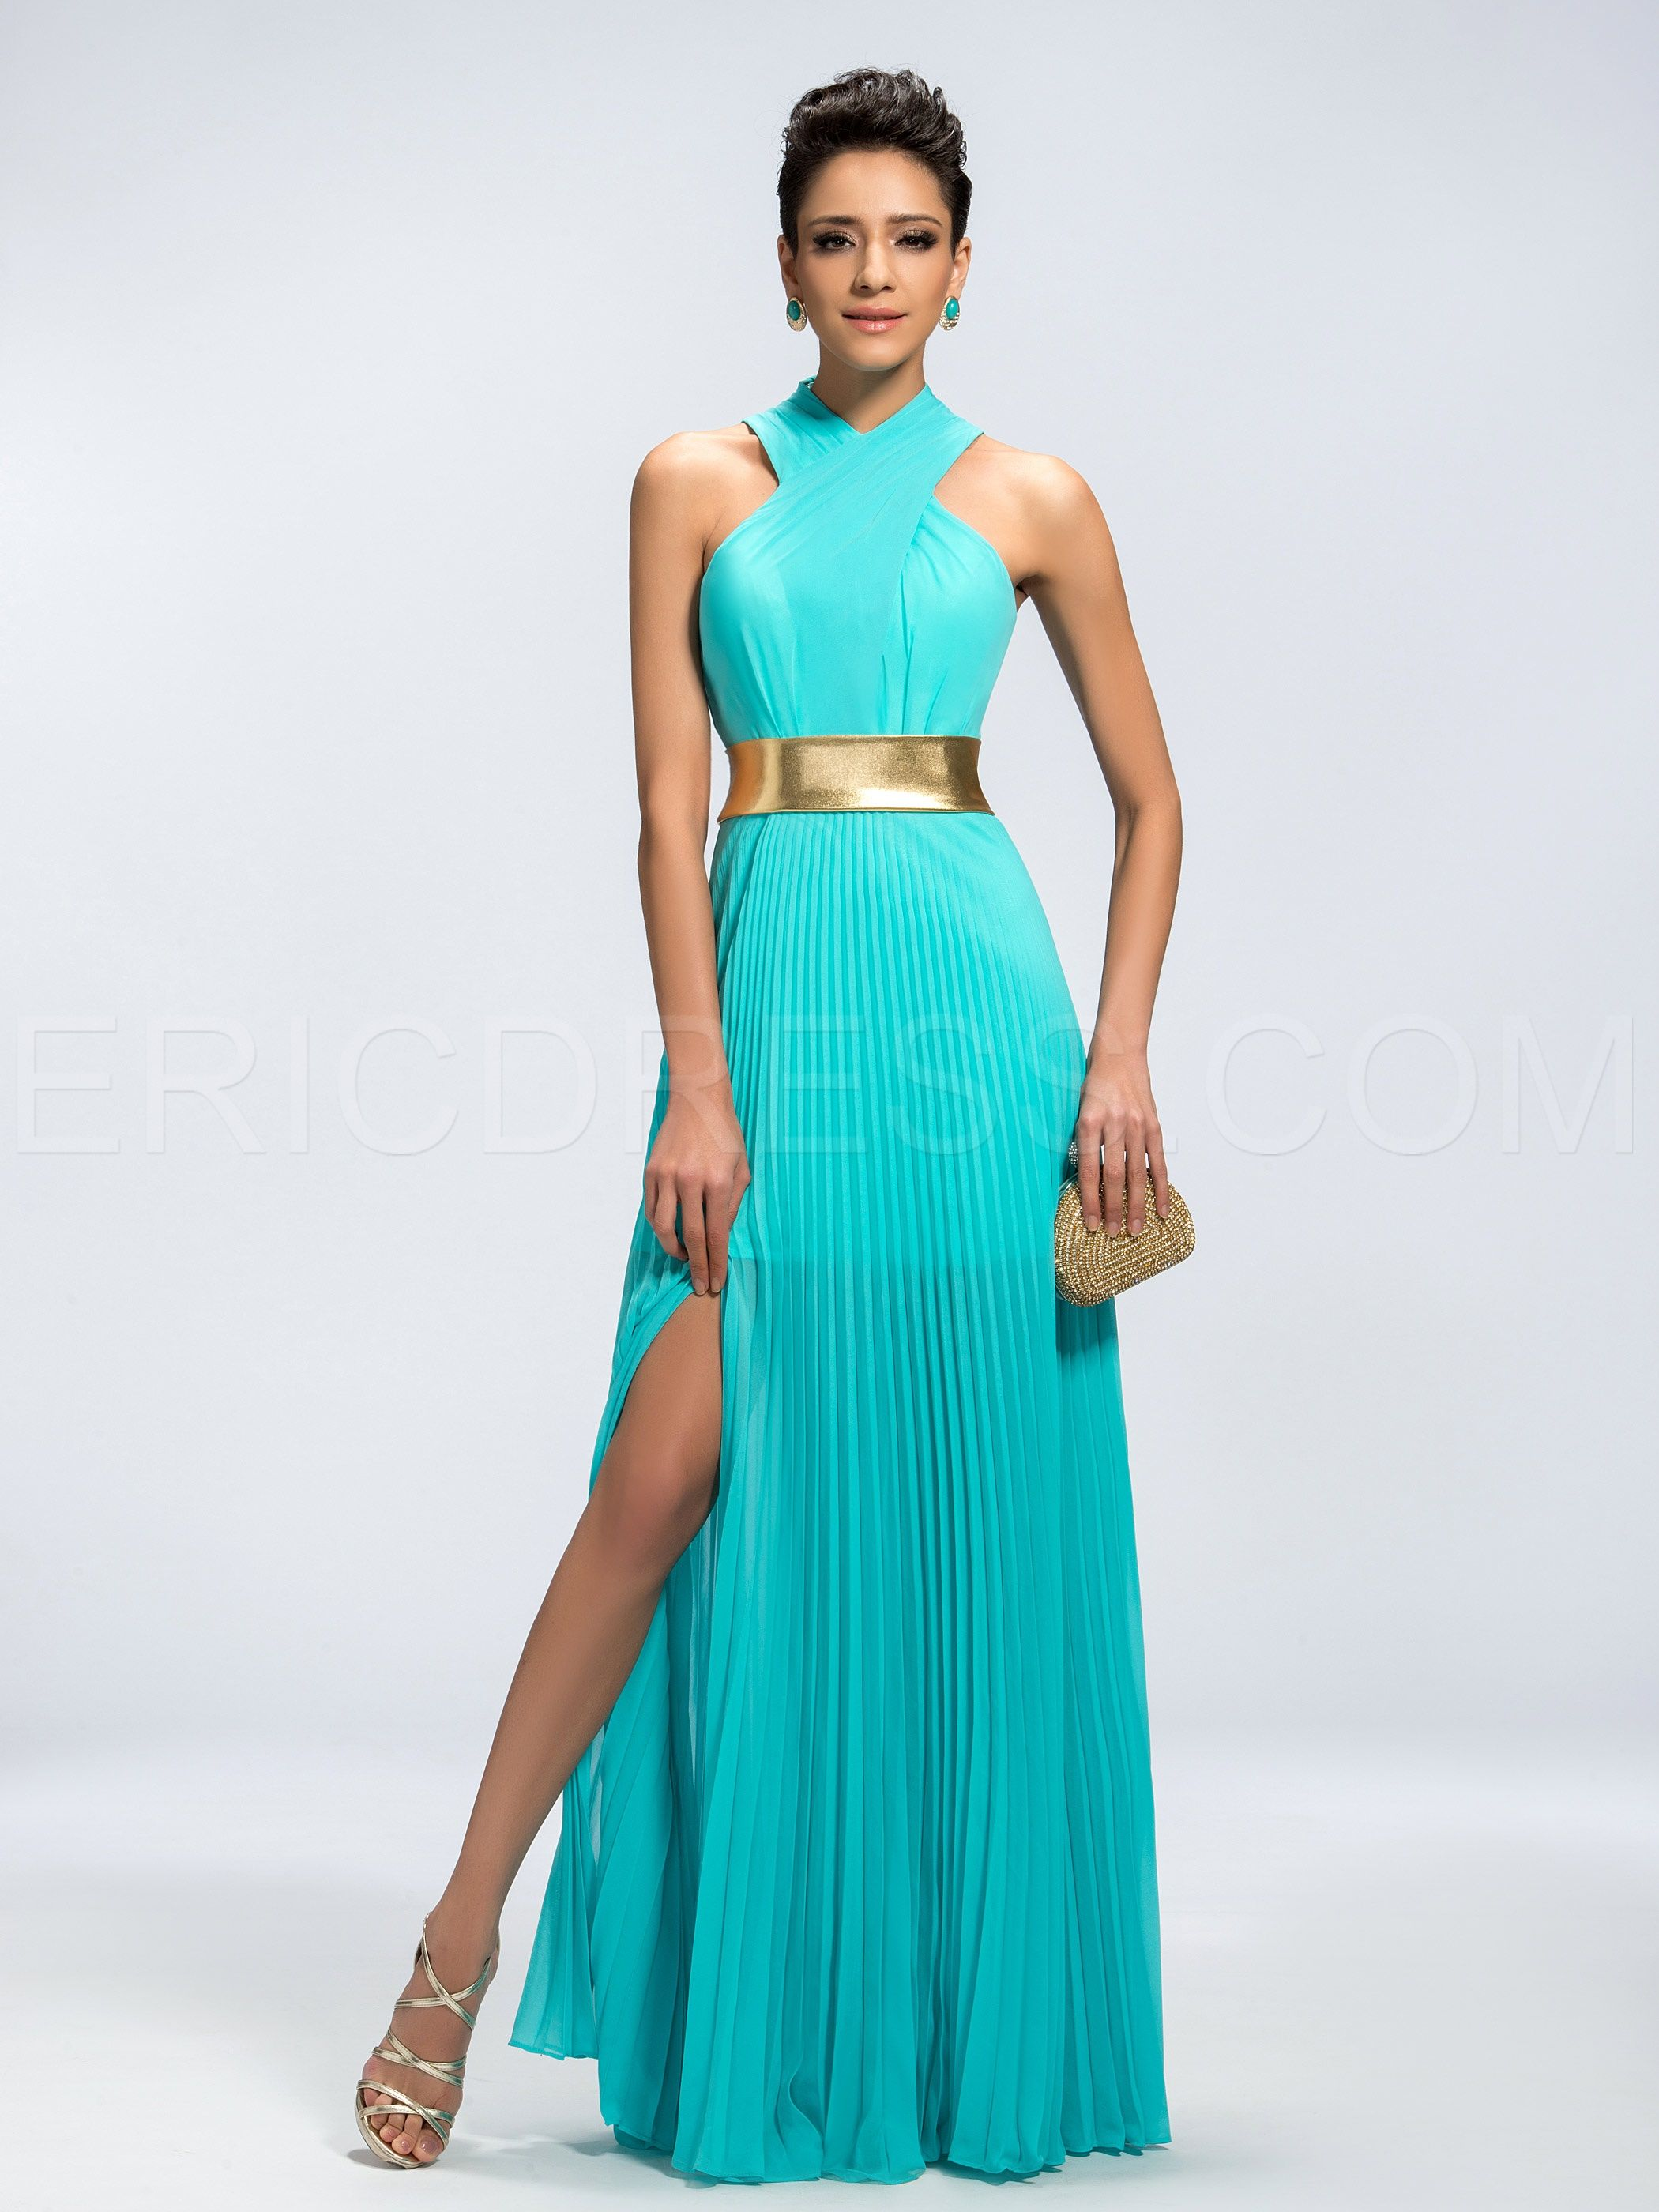 Classy Vogue A-Line Split-Front Evening Dress | Classy, Elegant ...